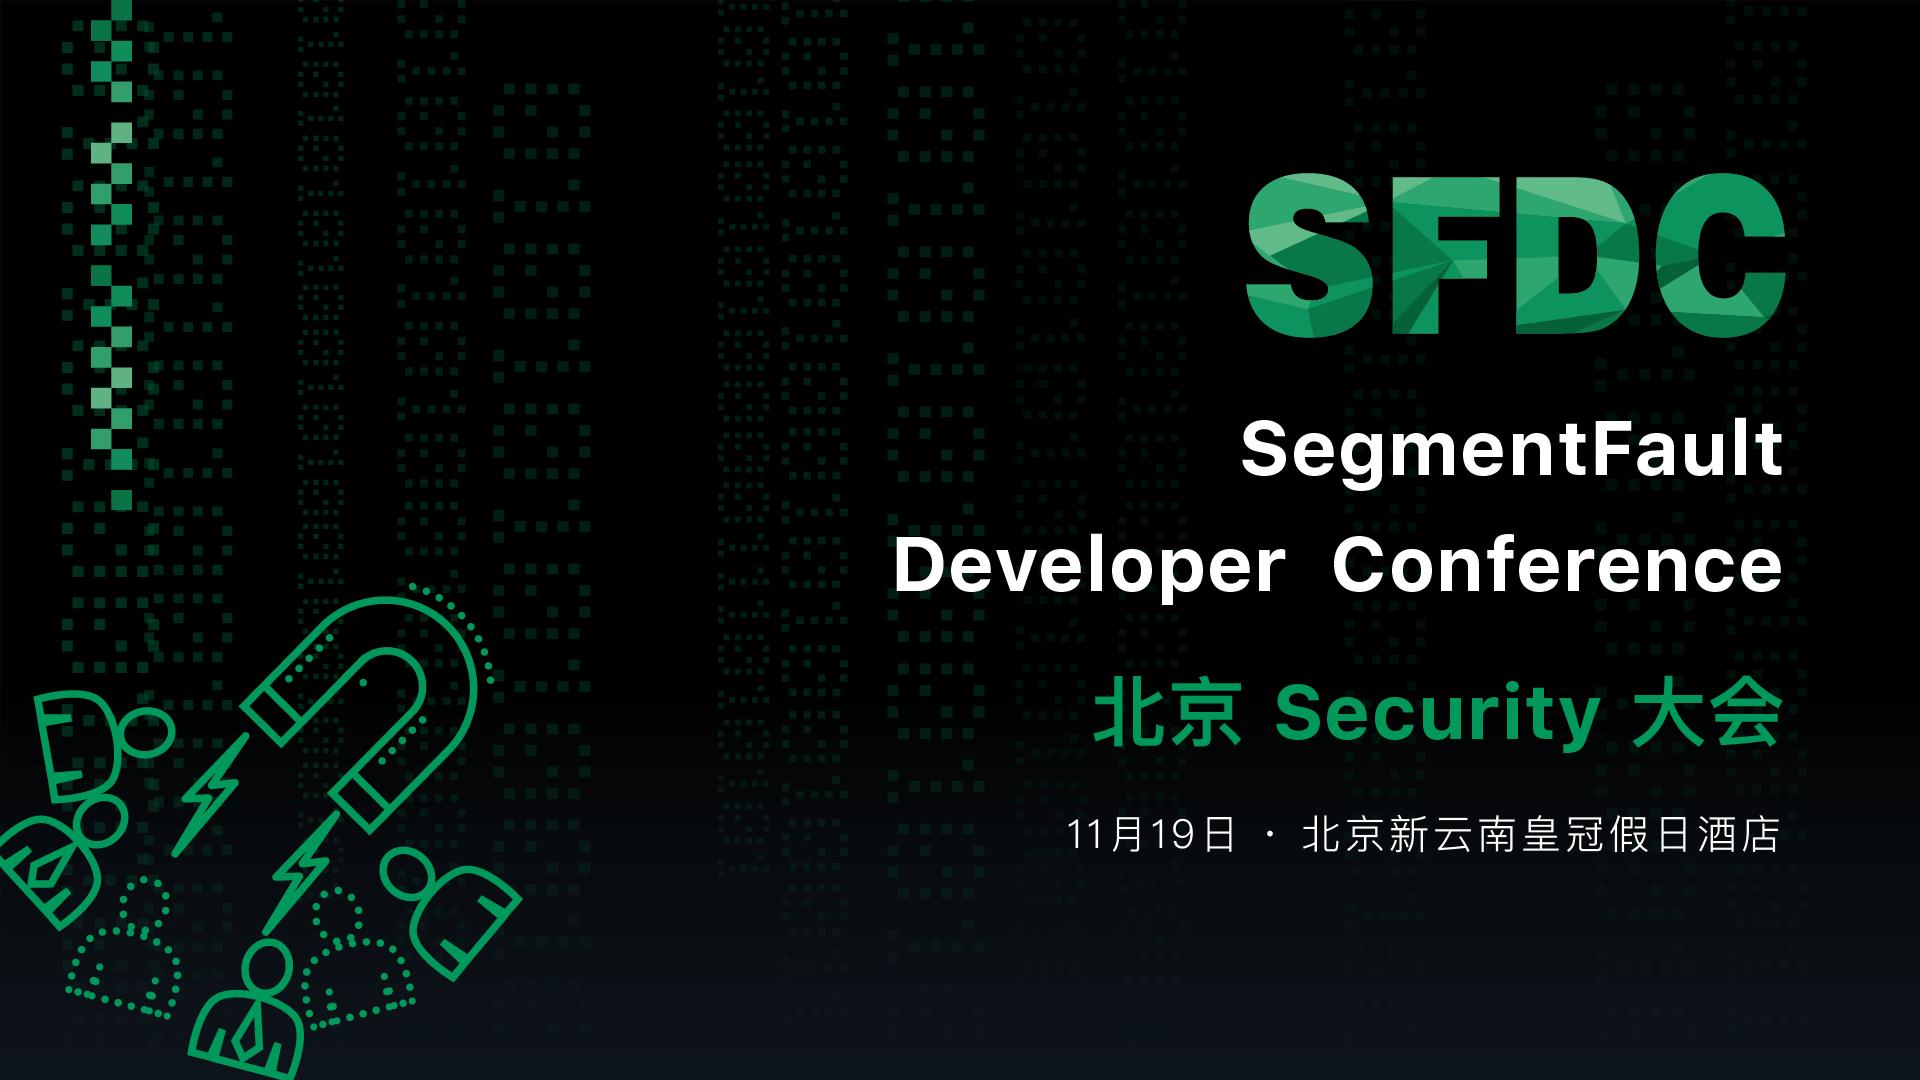 SegmentFault 2016 开发者大会北京站 - SFDC BJ 2016